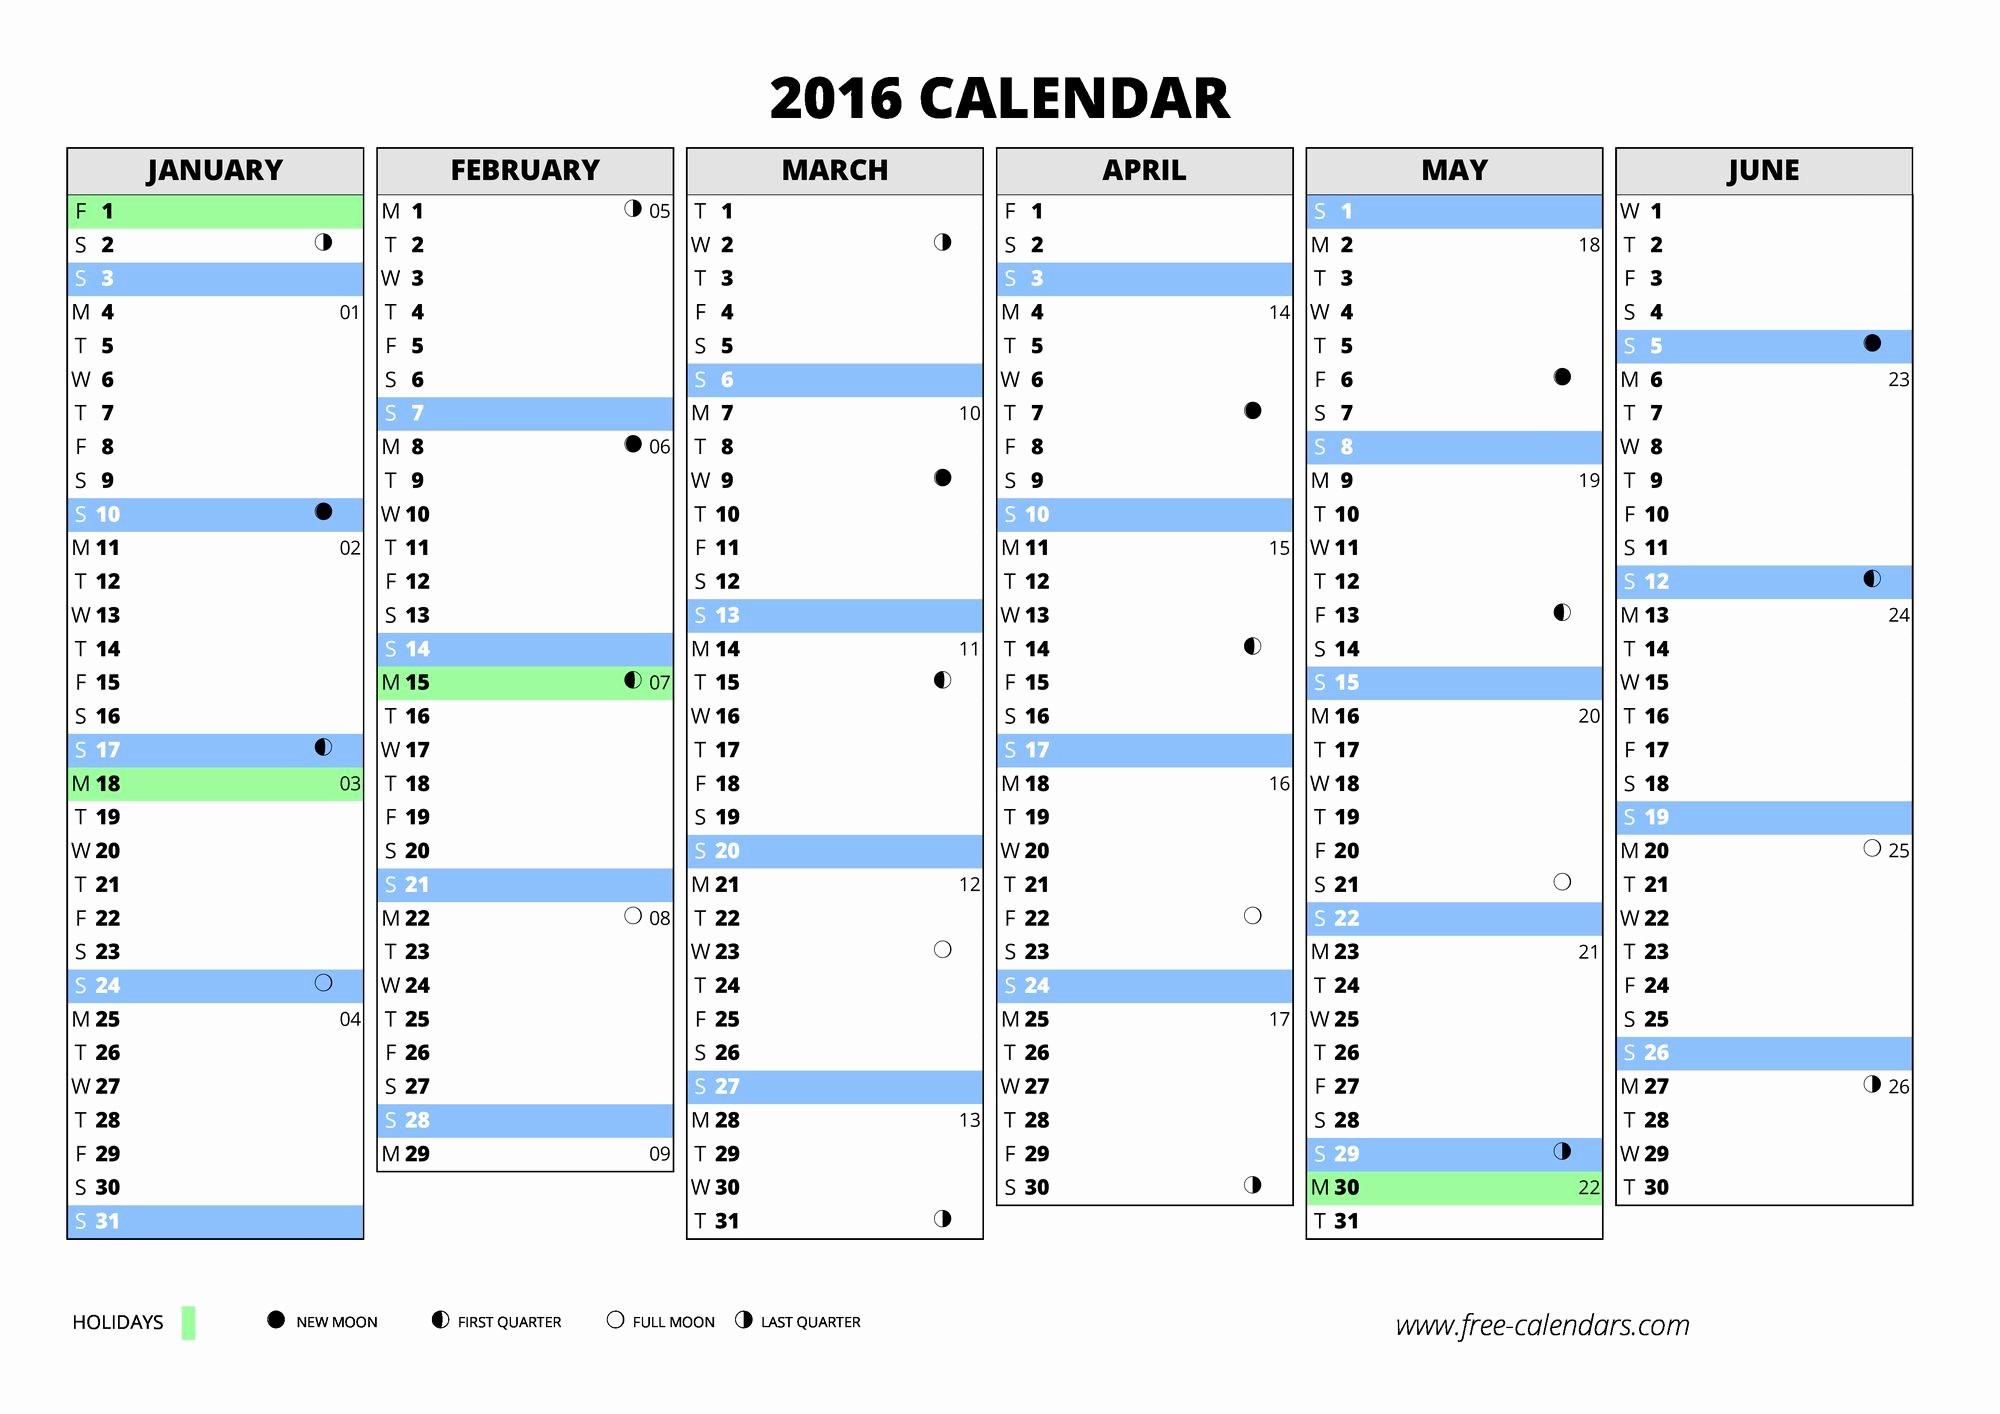 2016 Calendar Excel with Holidays Luxury 2016 Calendar ≡ Free Calendars